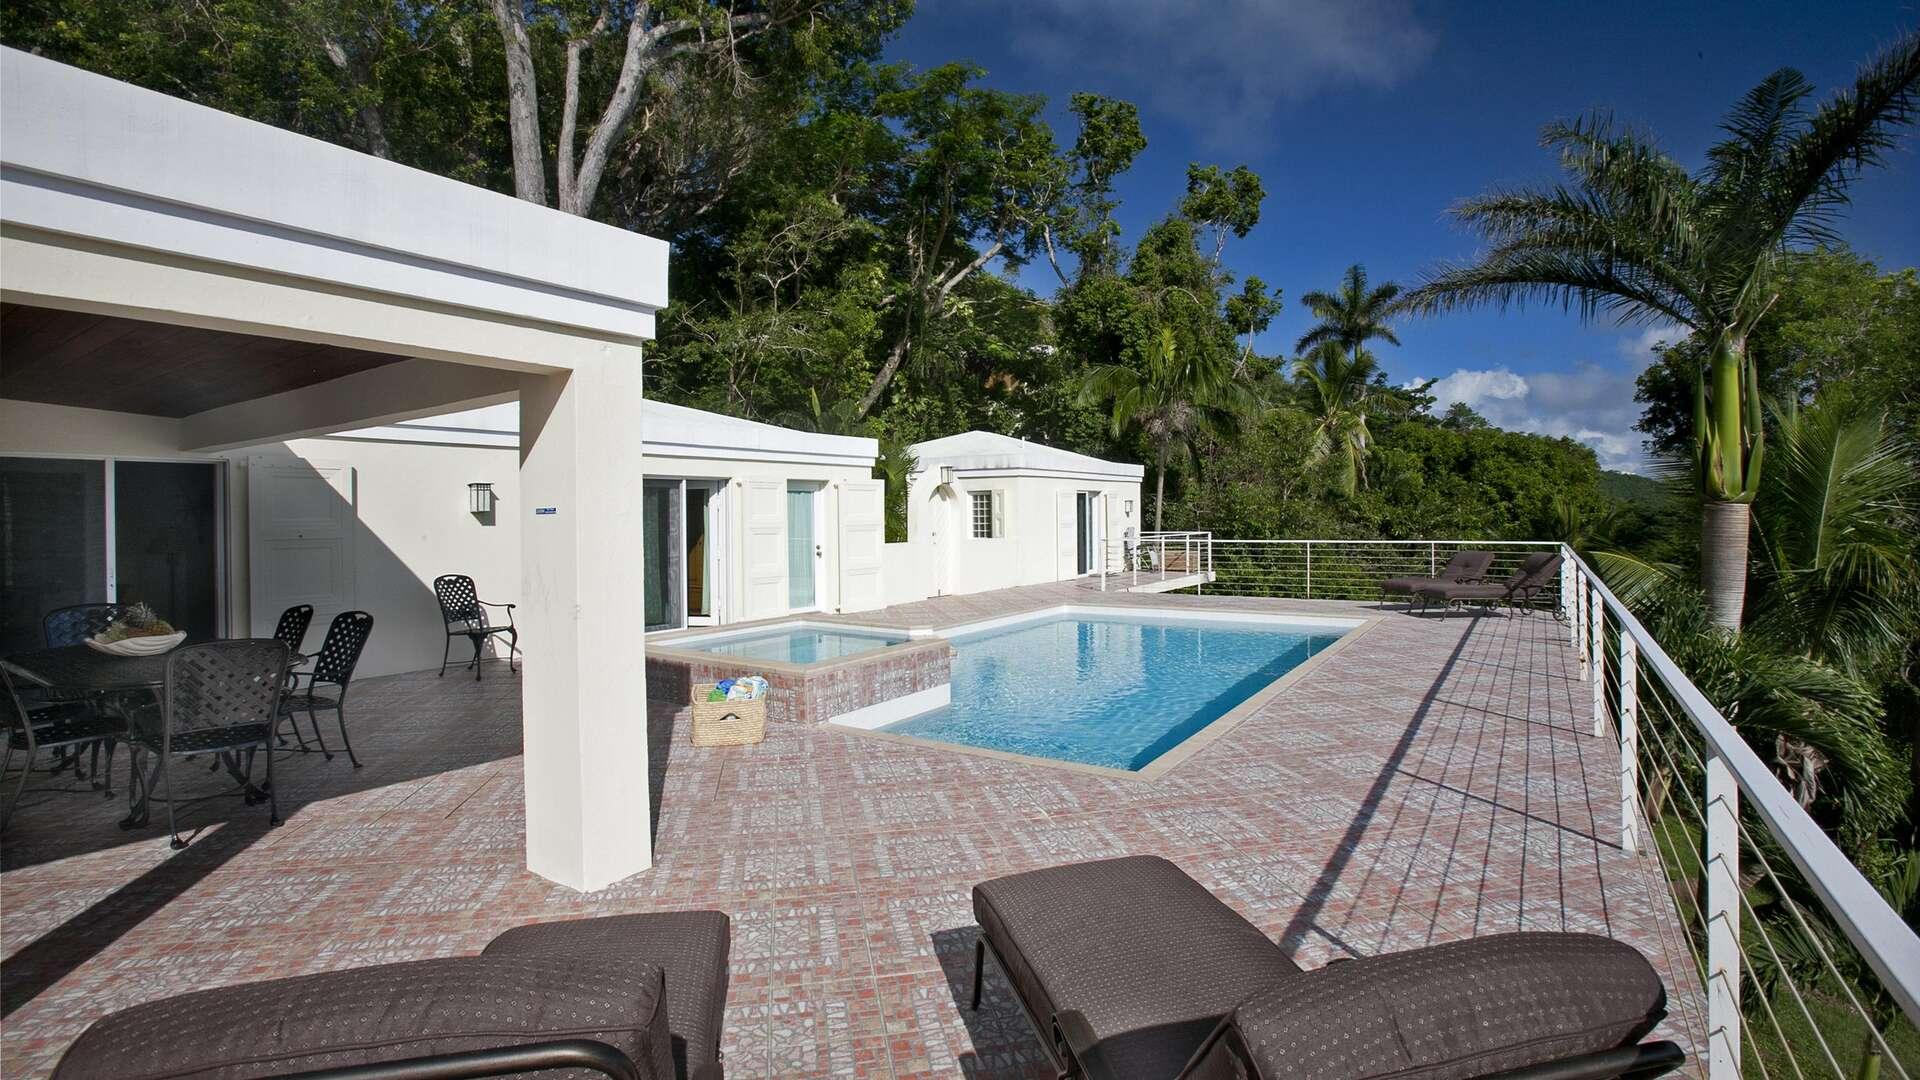 Luxury villa rentals caribbean - Usvi - St thomas - Malfolie - High View - Image 1/20